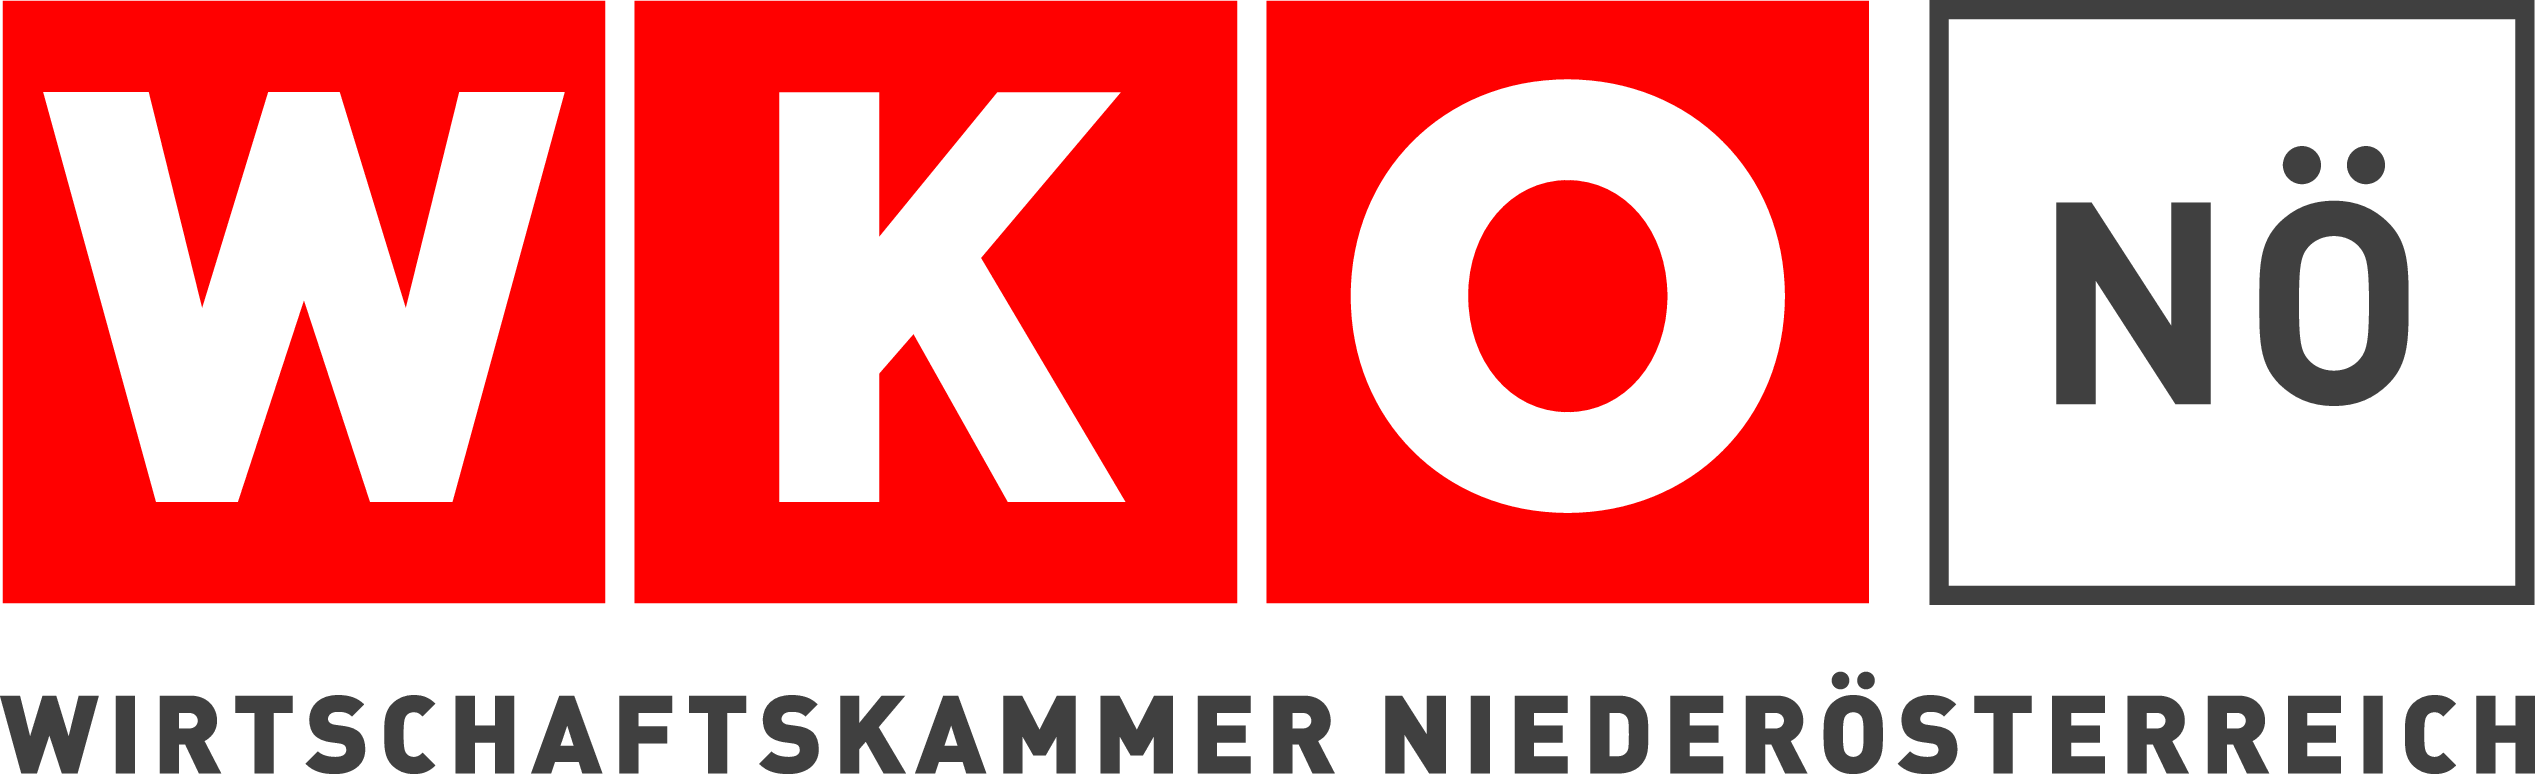 WKO_NOE_